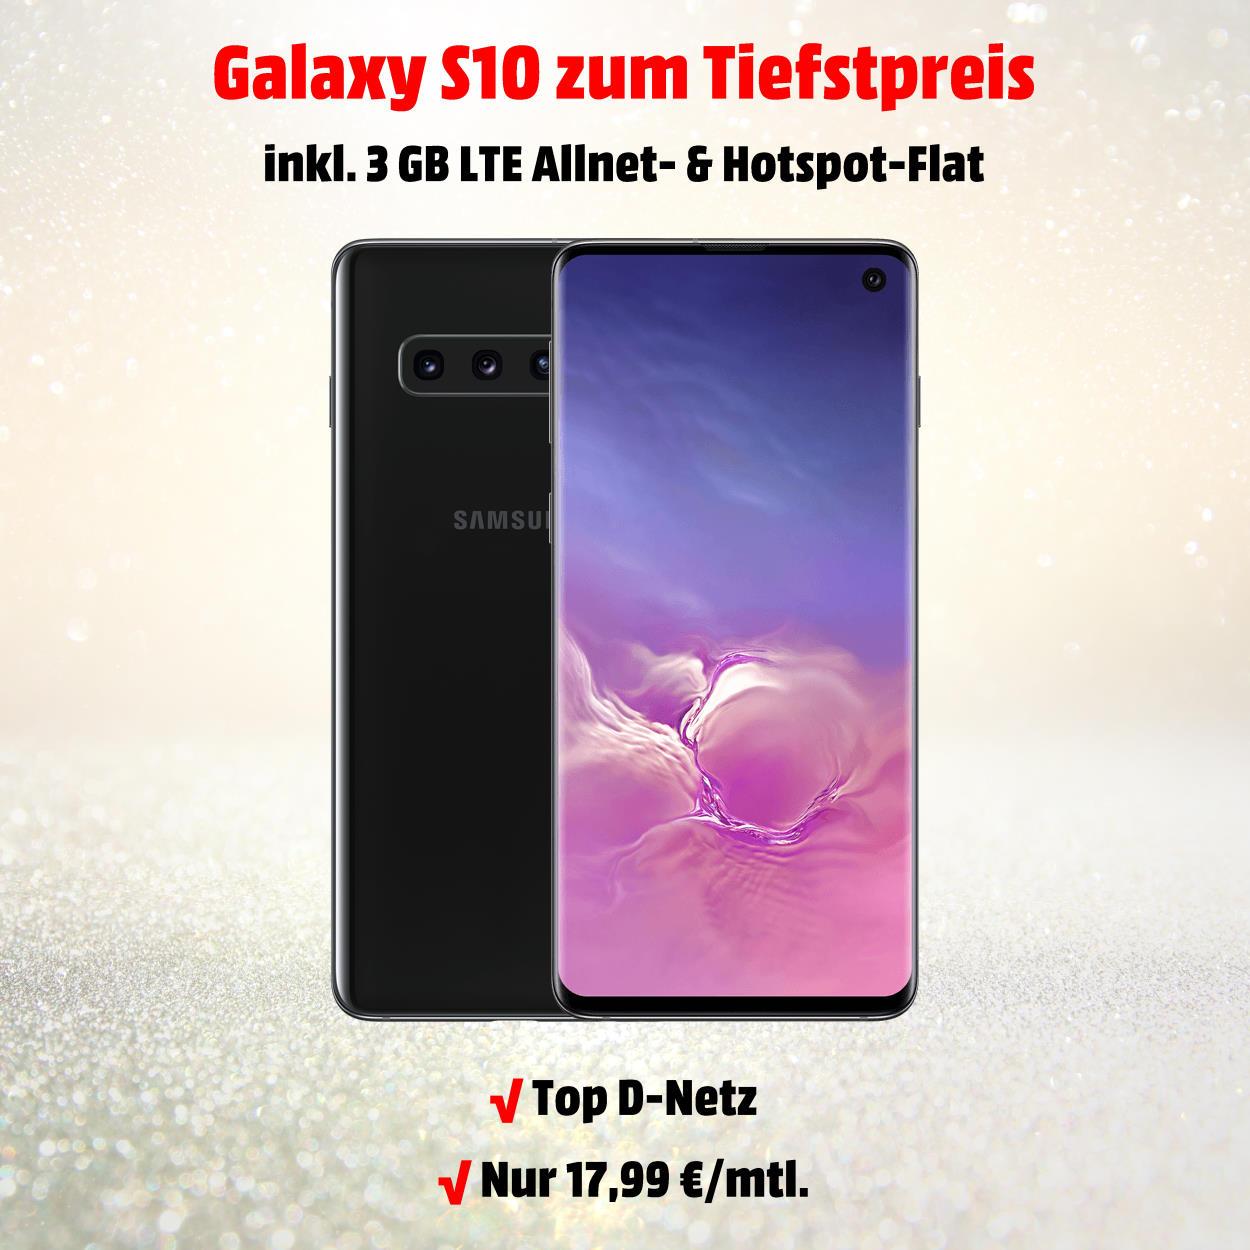 Samsung Galaxy S10 inkl. 3 GB LTE Allnet-Flat zum absoluten Tiefstpreis - Handy-Tarifvergleich